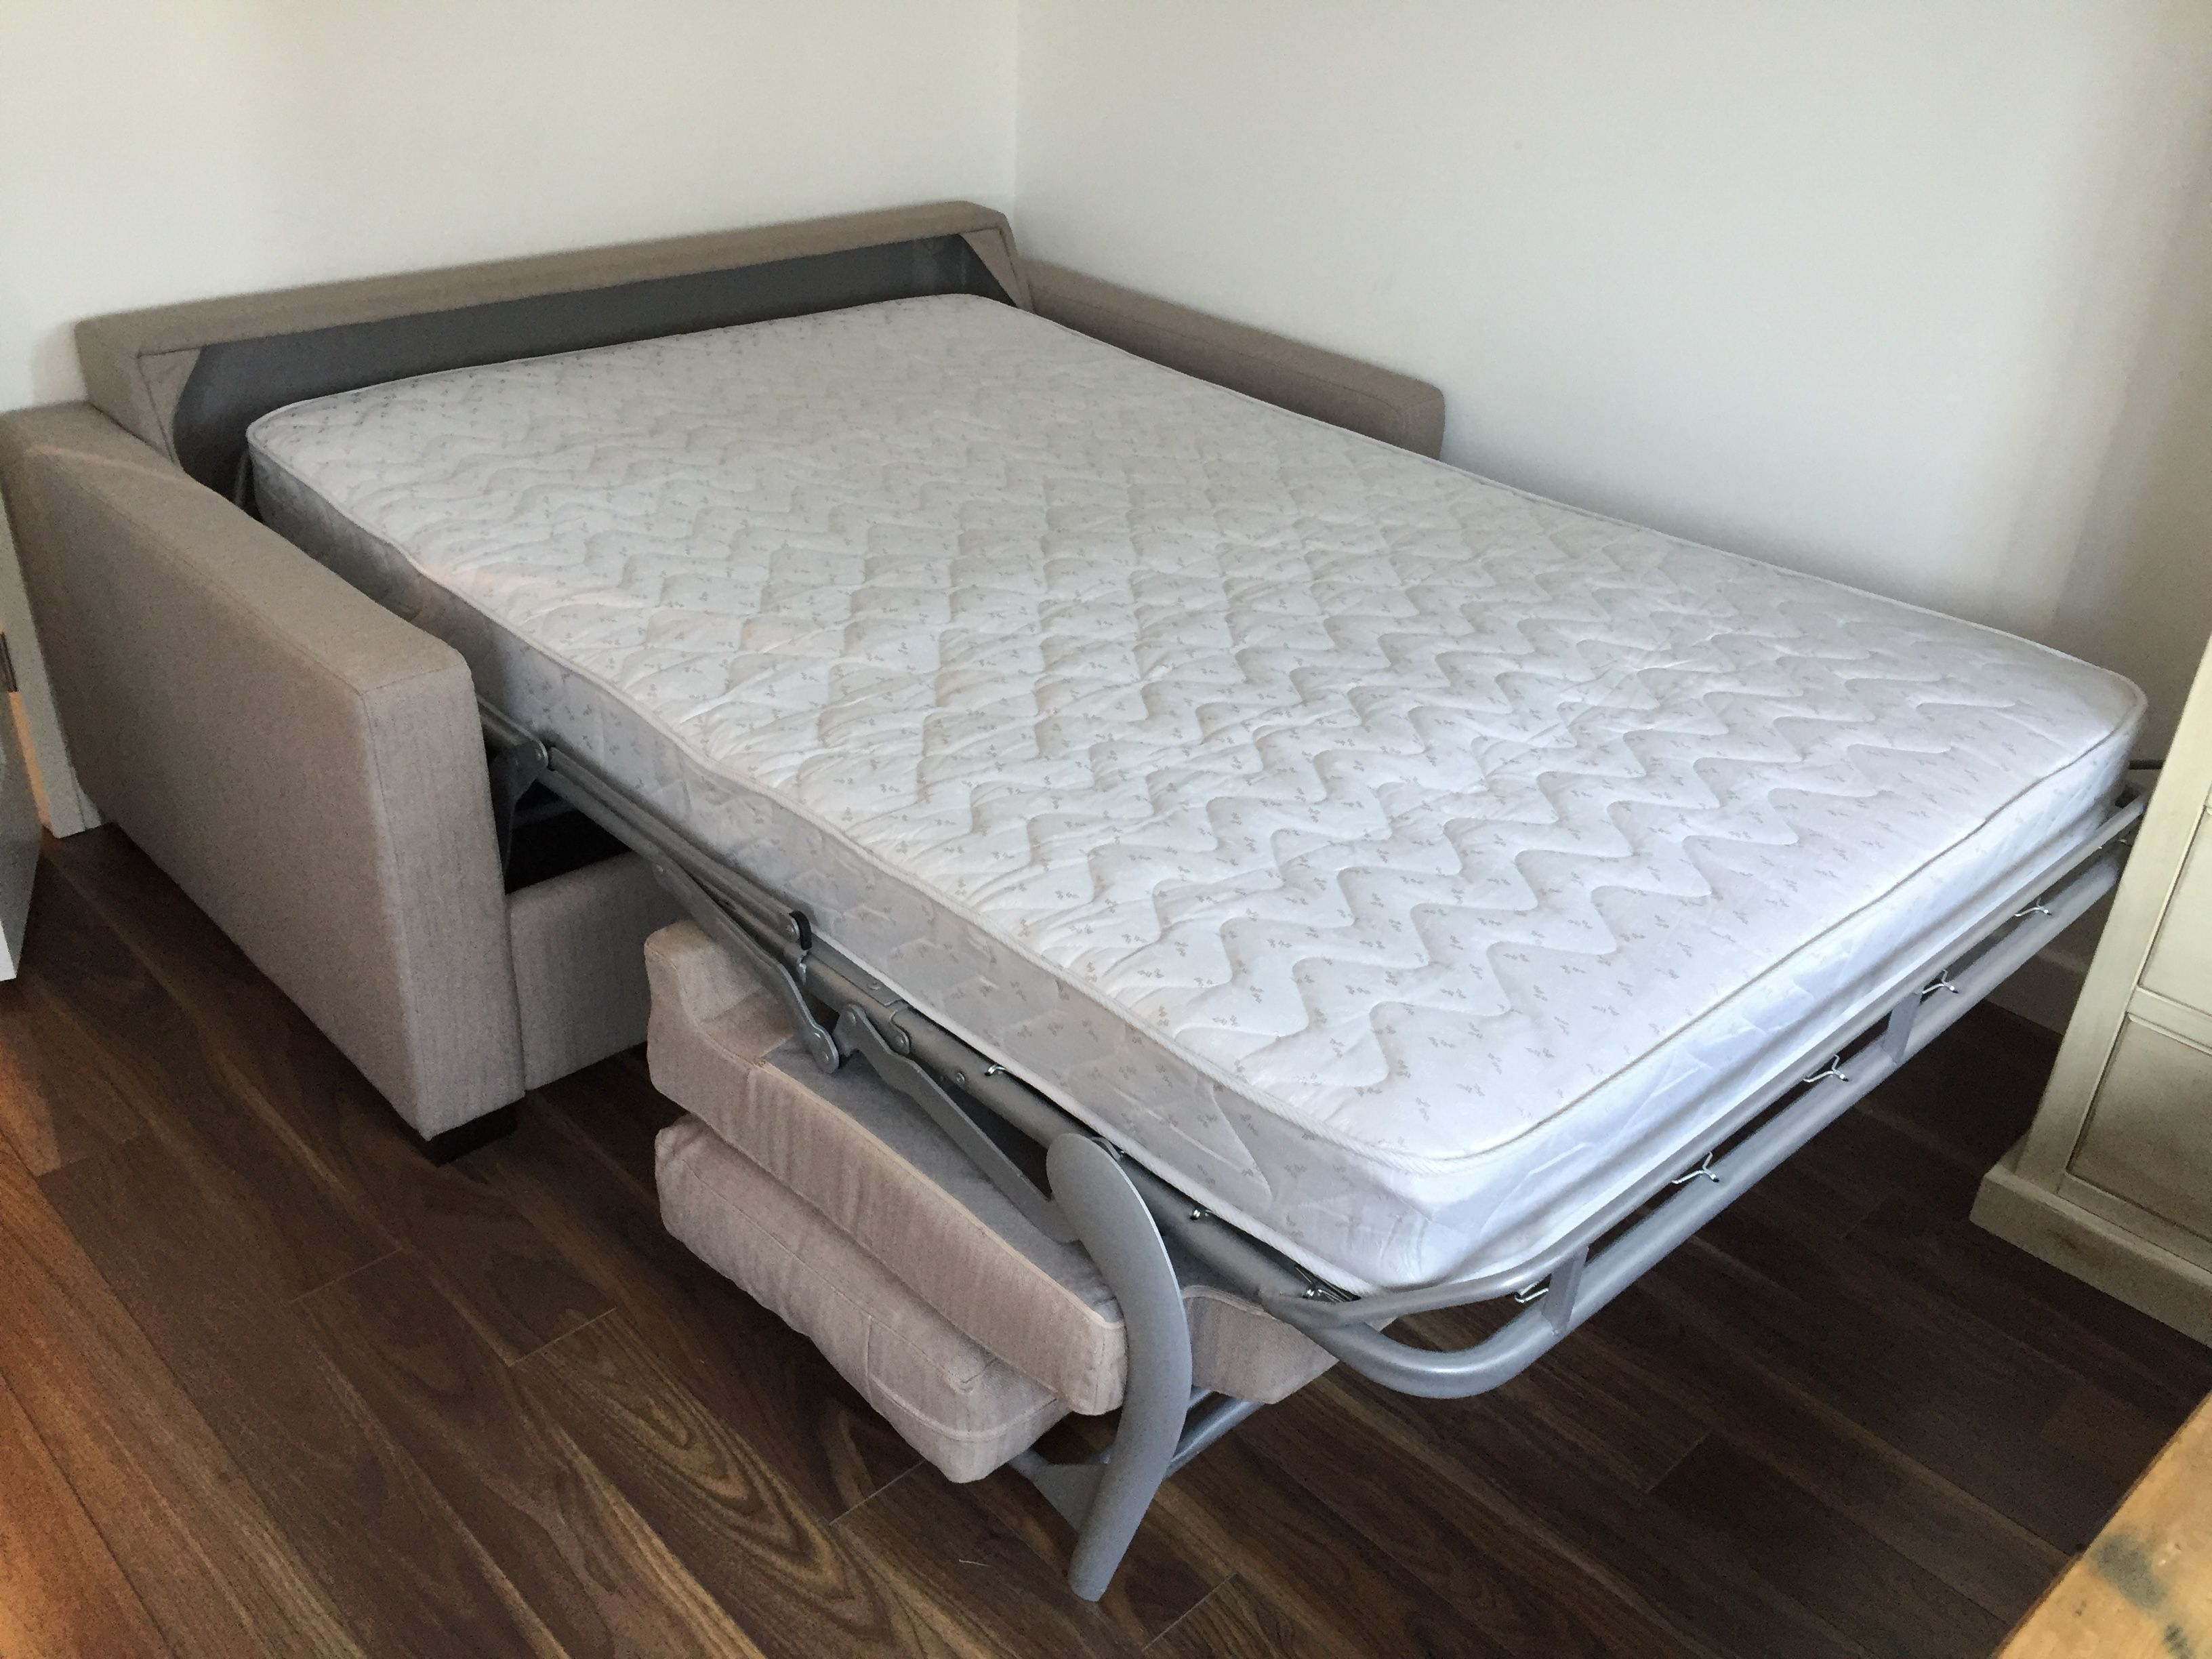 Ash regular use 140 cm x 195 cm bonnel reflex foam mattress in a